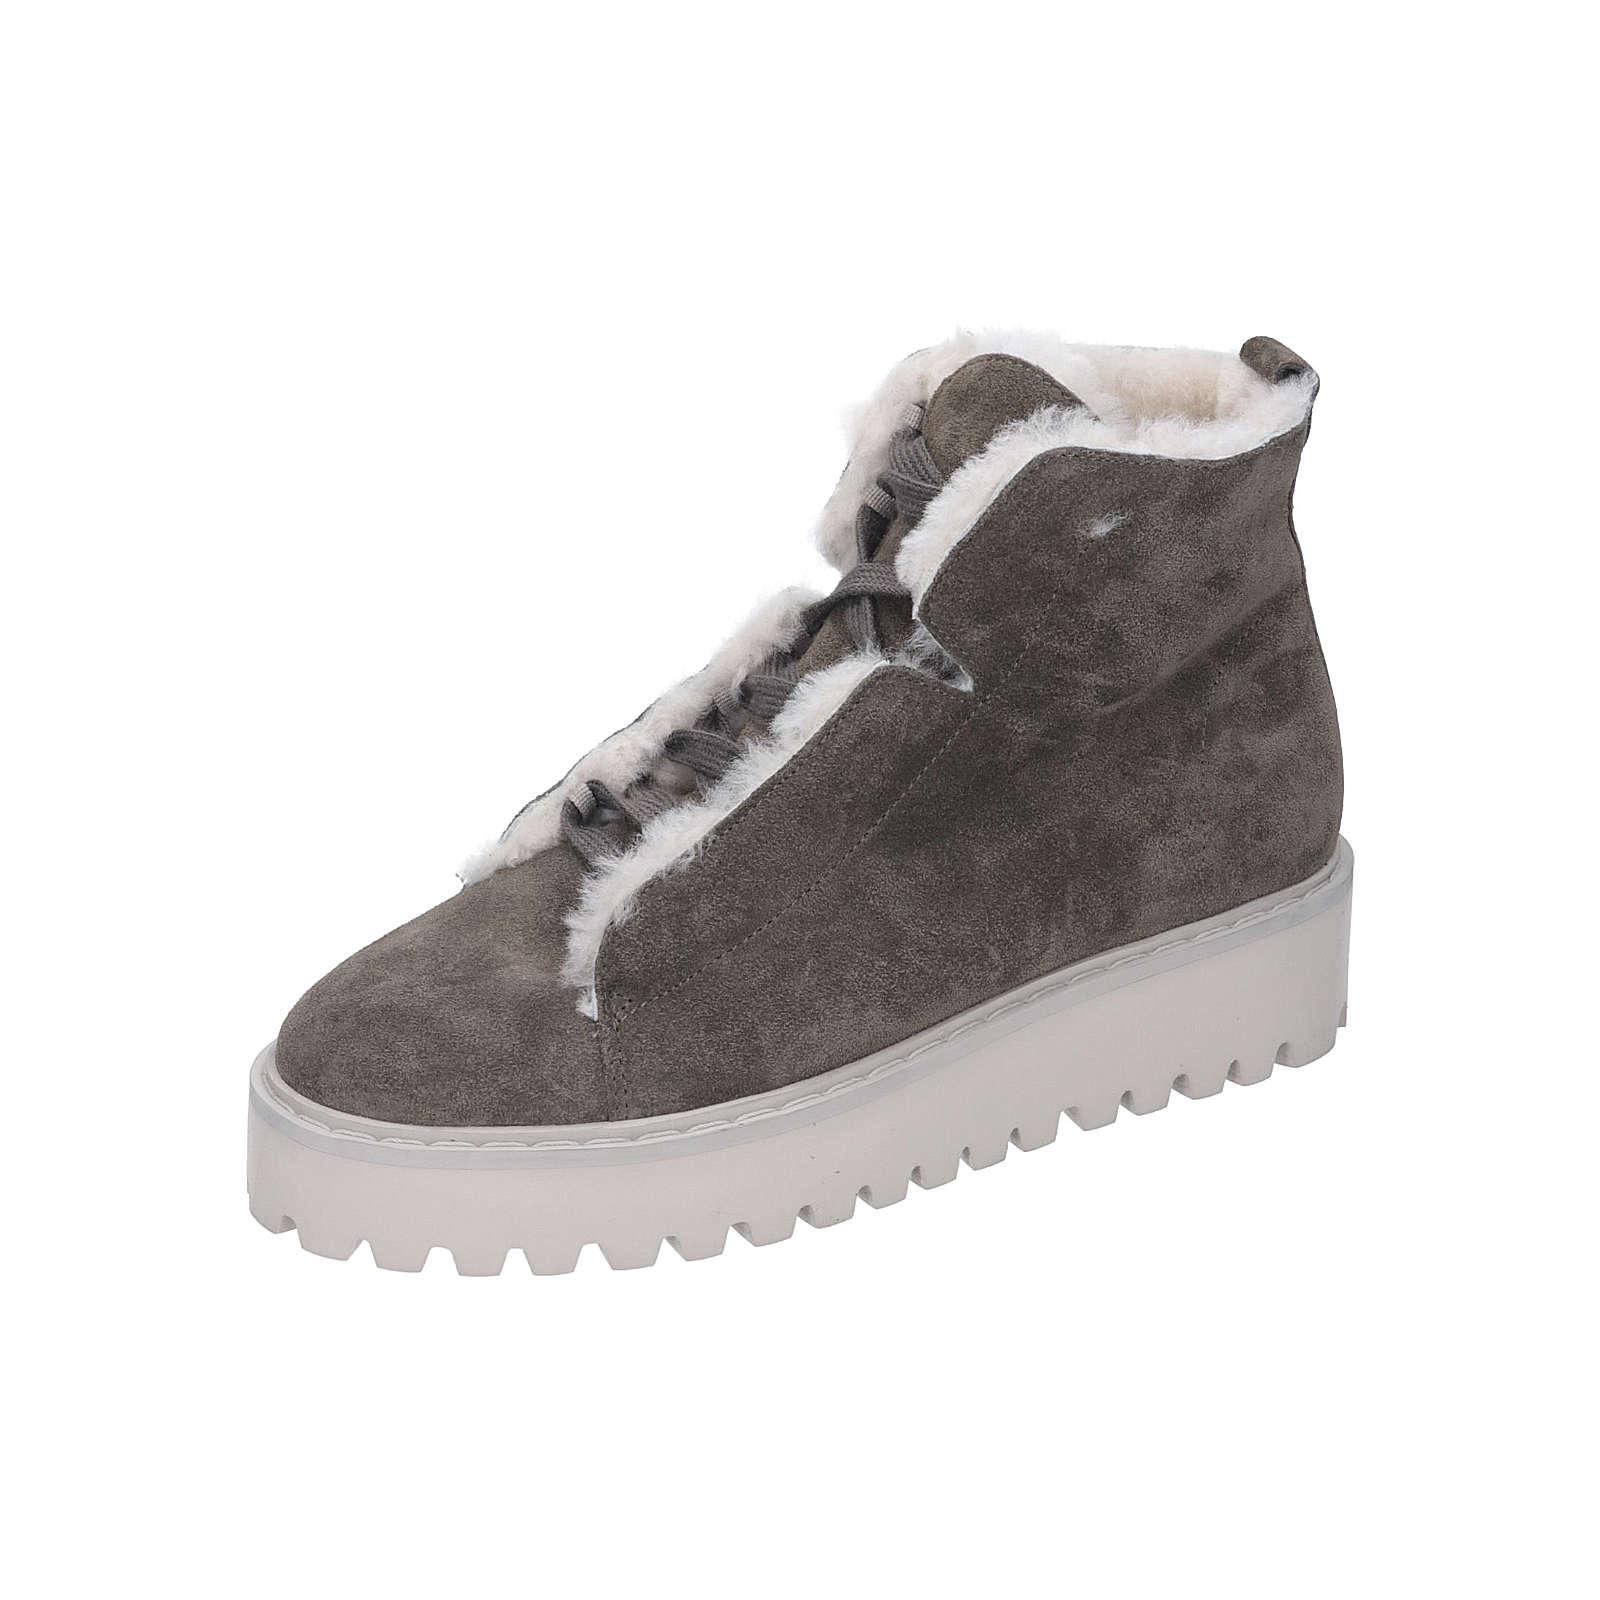 Kennel & Schmenger Sneakers High grau Damen Gr. 37,5